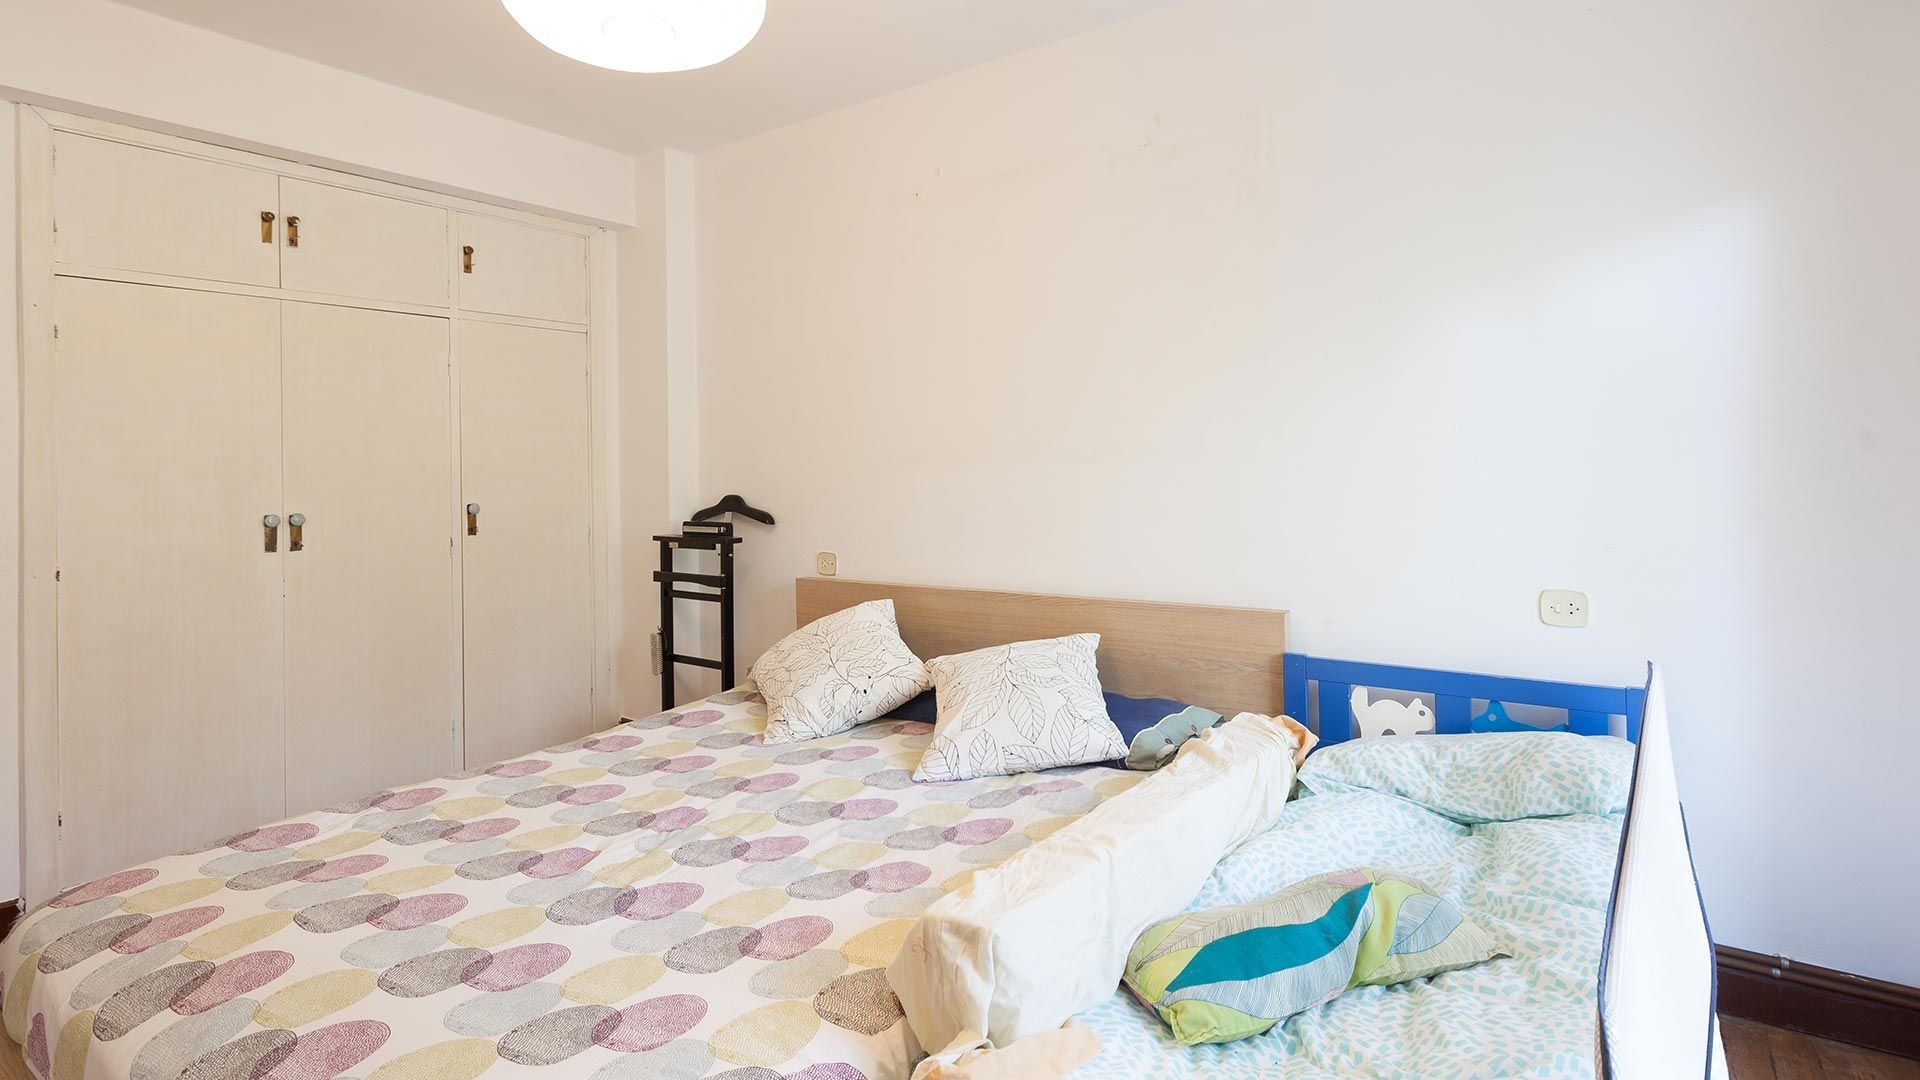 Dormitorio colorido antes